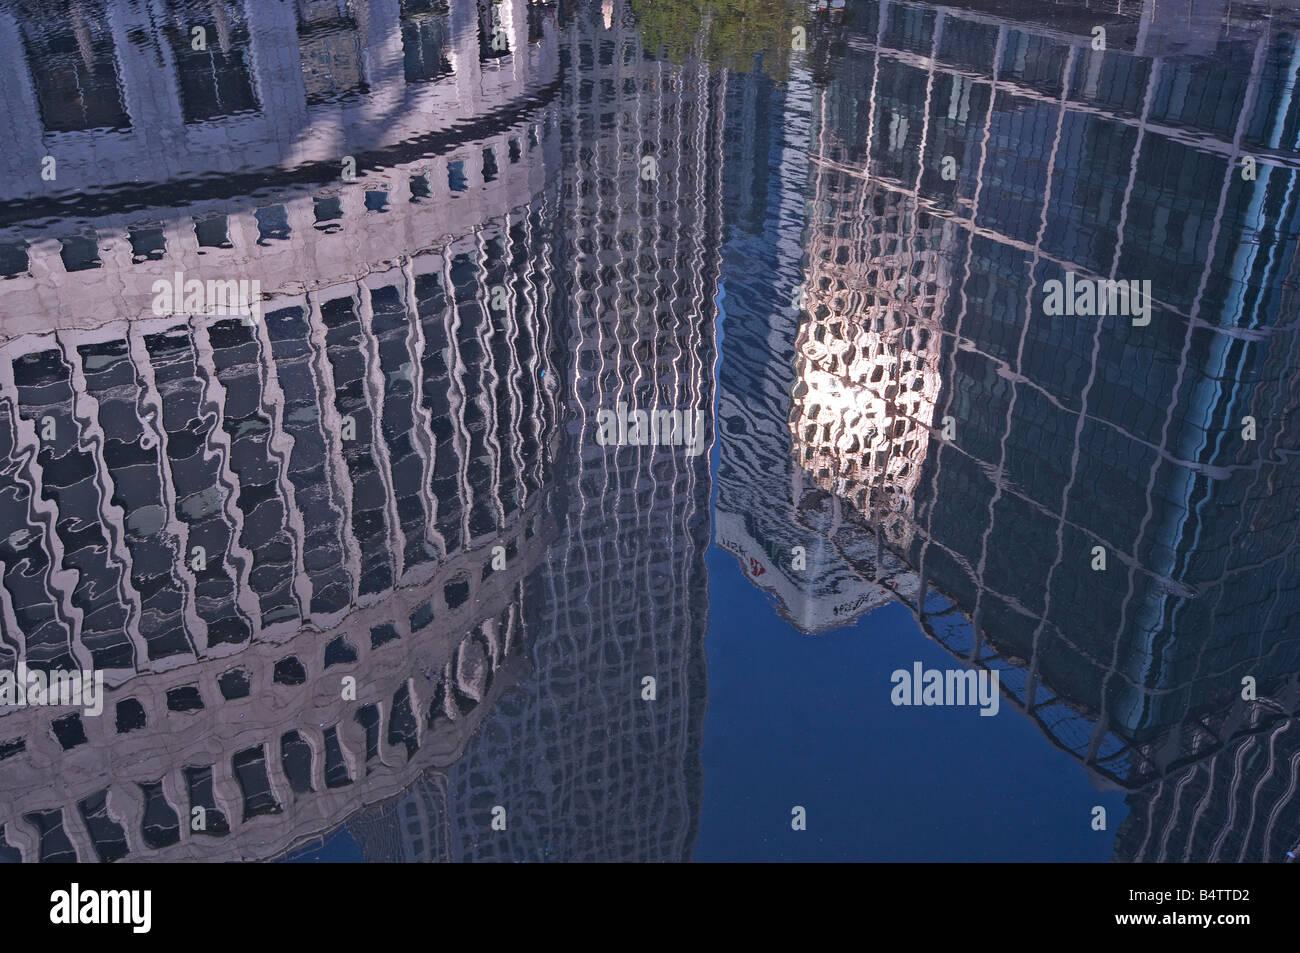 Stadt-Reflexionen in Canary Wharf Stockbild